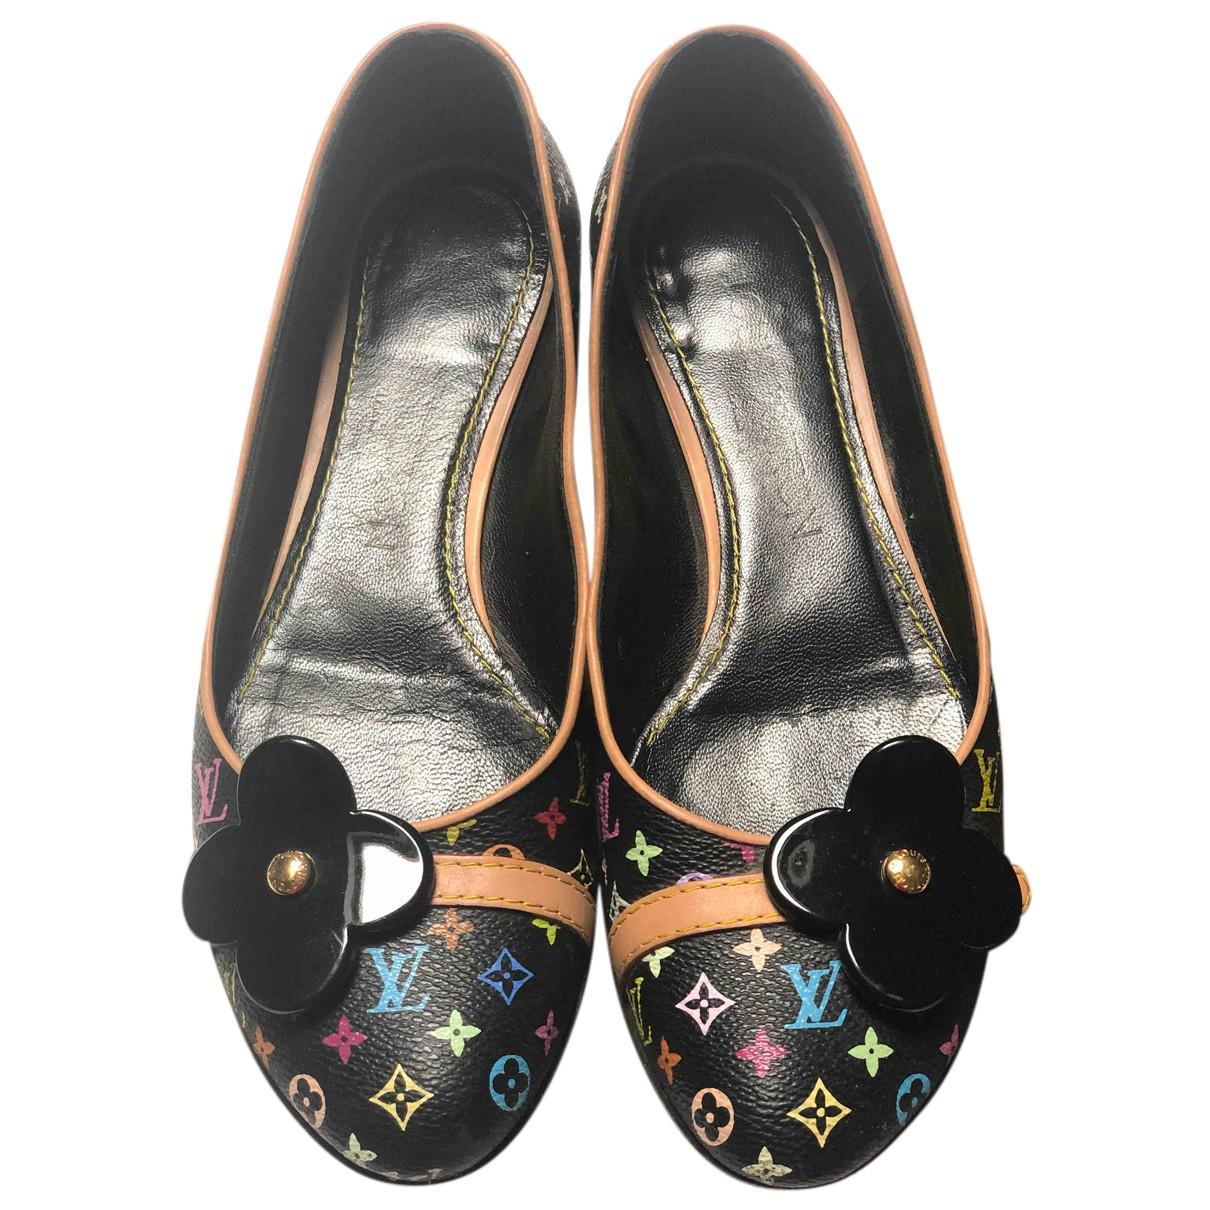 Louis Vuitton N Black Cloth Ballet flats for Women 35 EU